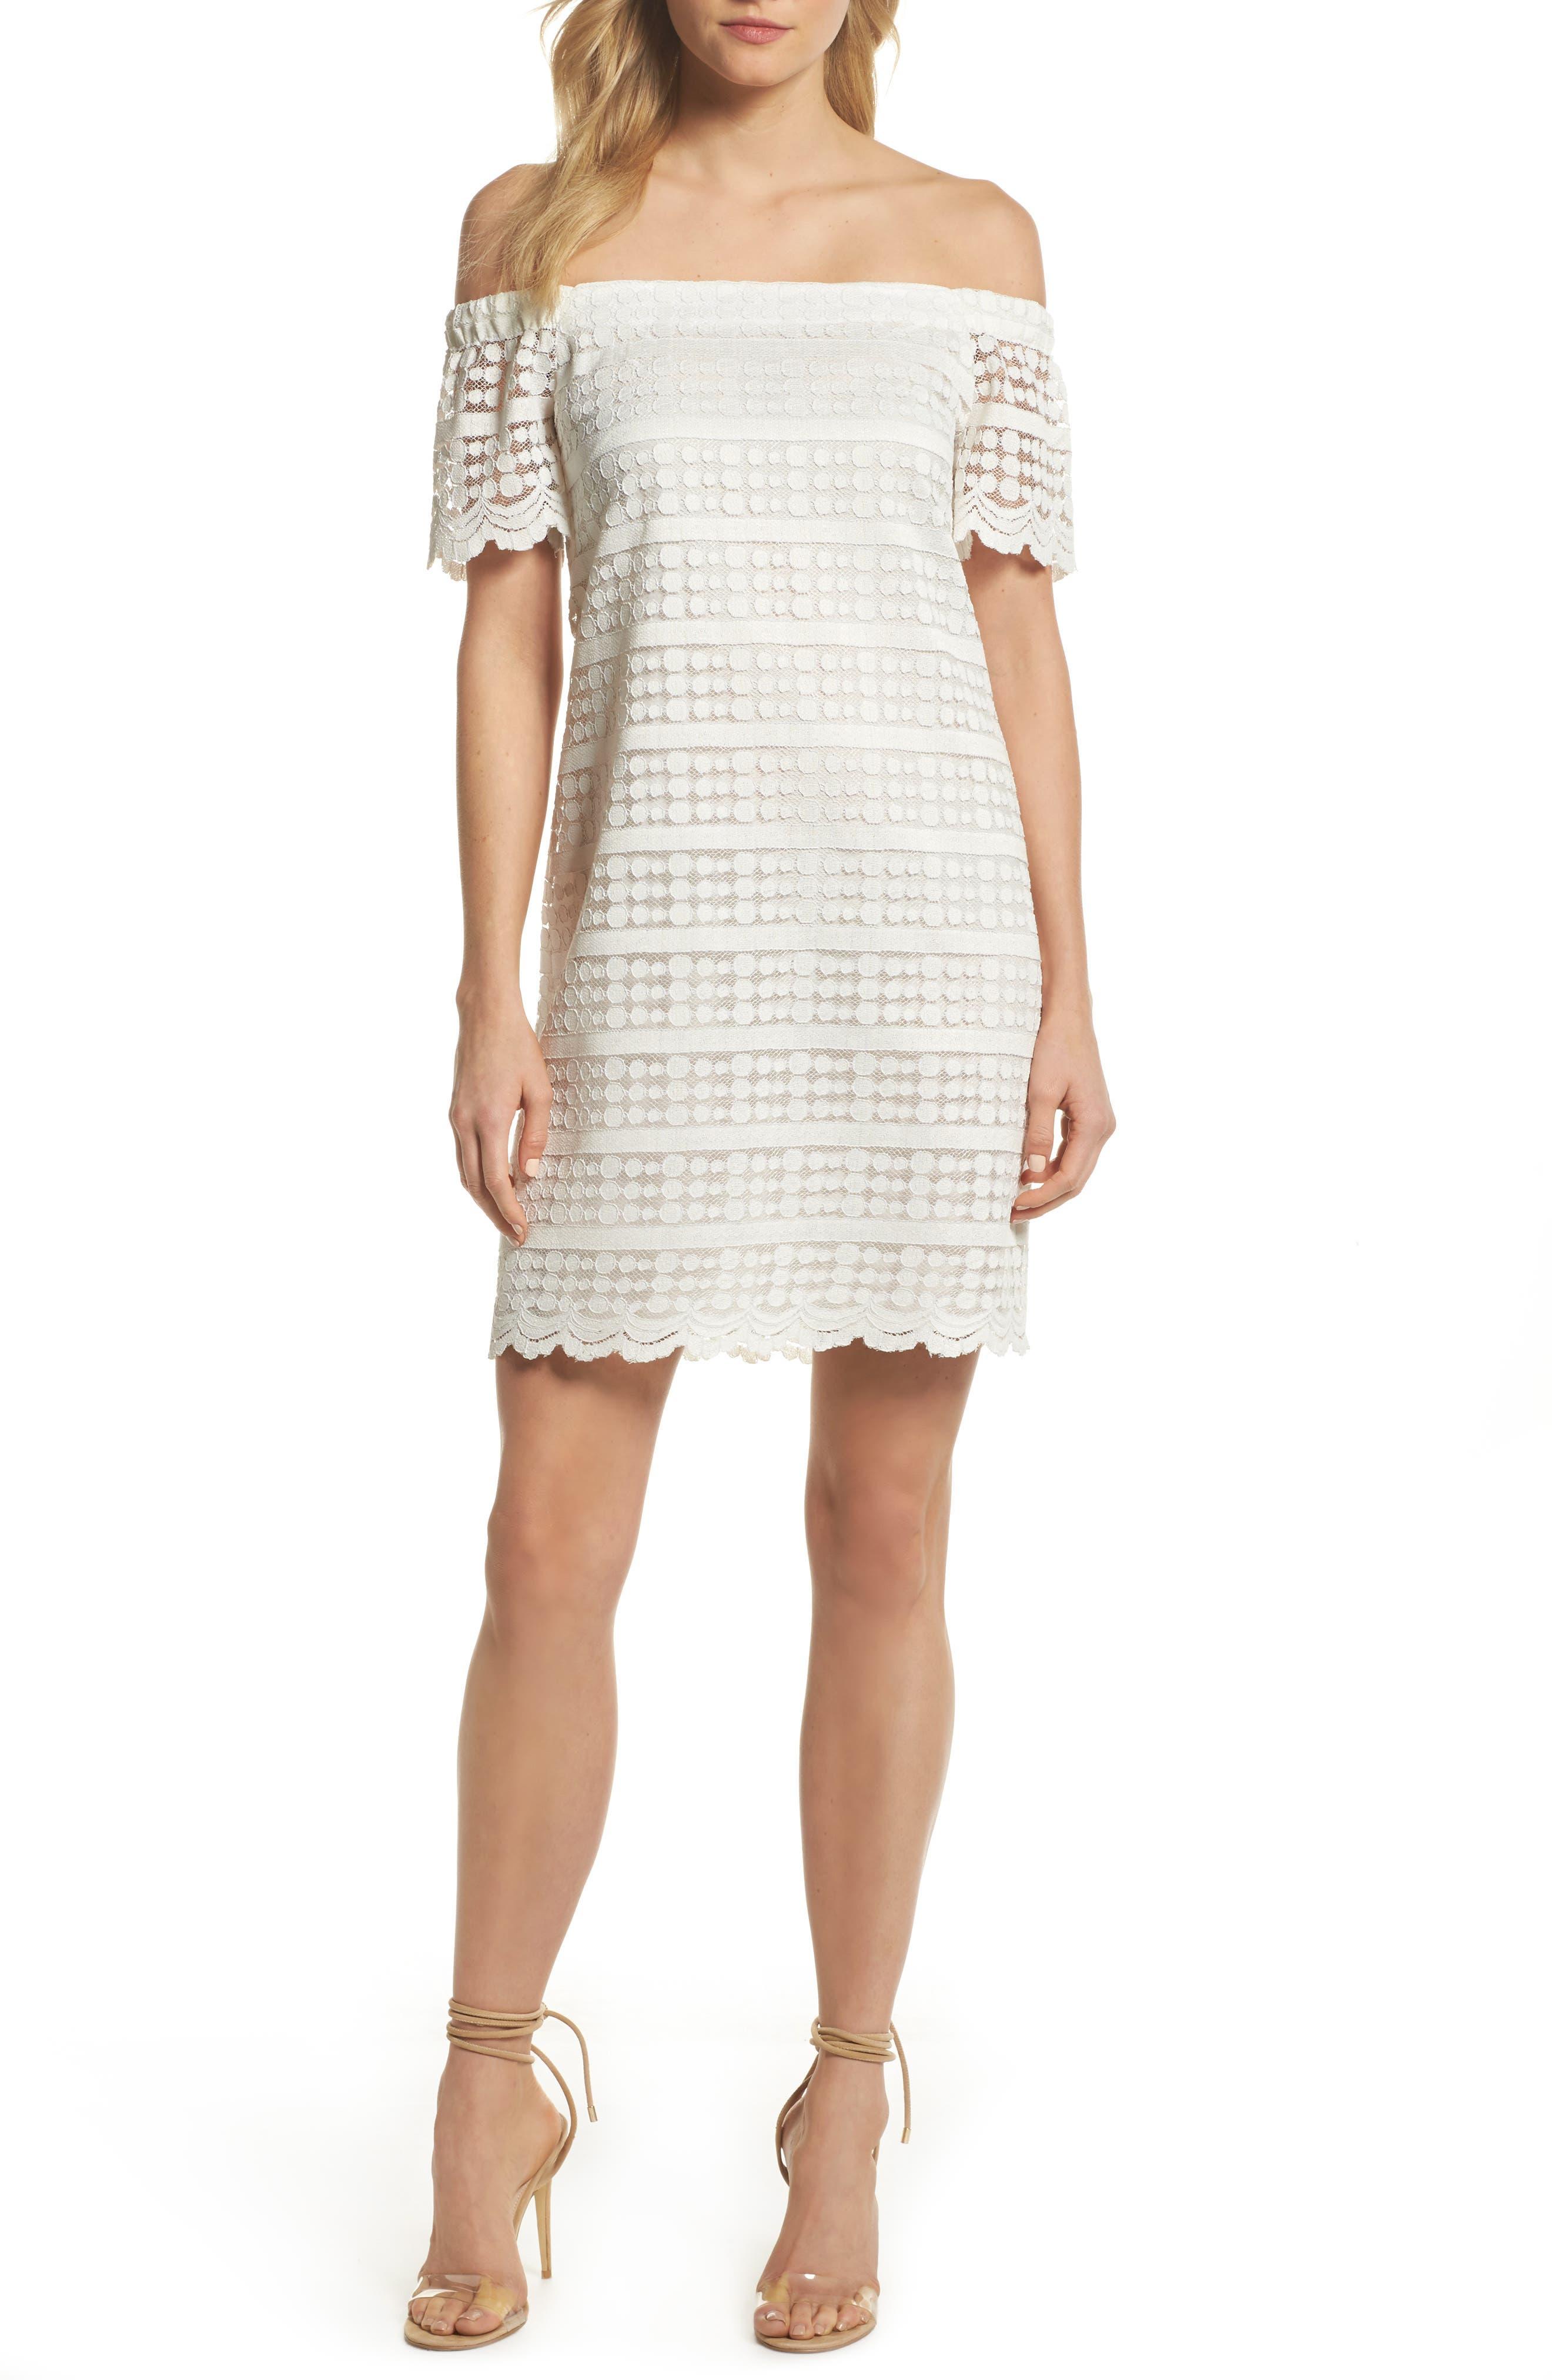 Merengue Off the Shoulder Minidress,                         Main,                         color, White